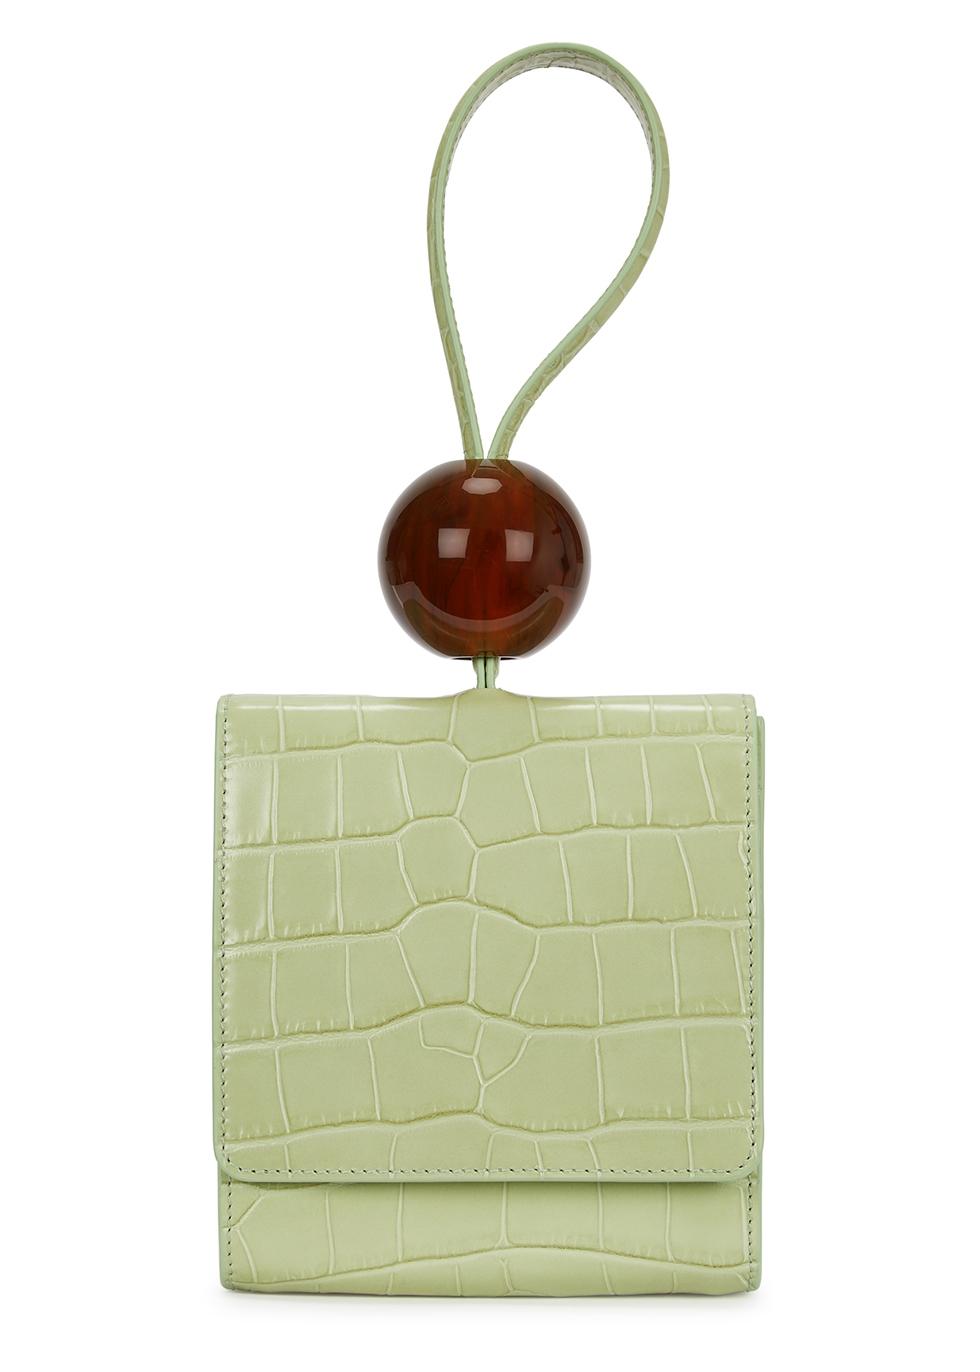 Ball mini mint green leather clutch - BY FAR